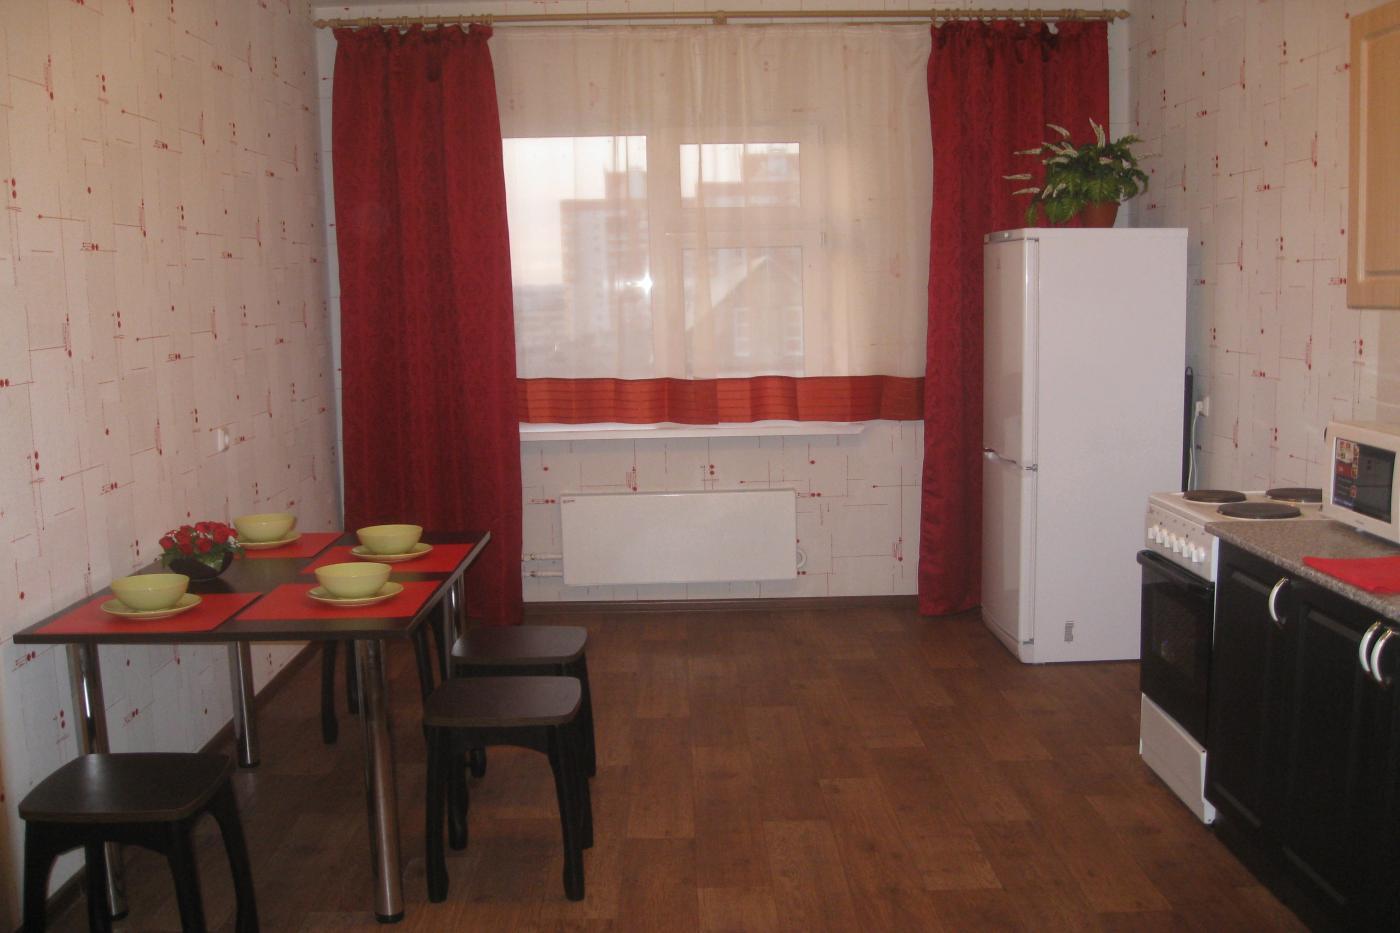 3-комнатная квартира посуточно (вариант № 917), ул. Адоратского улица, фото № 3